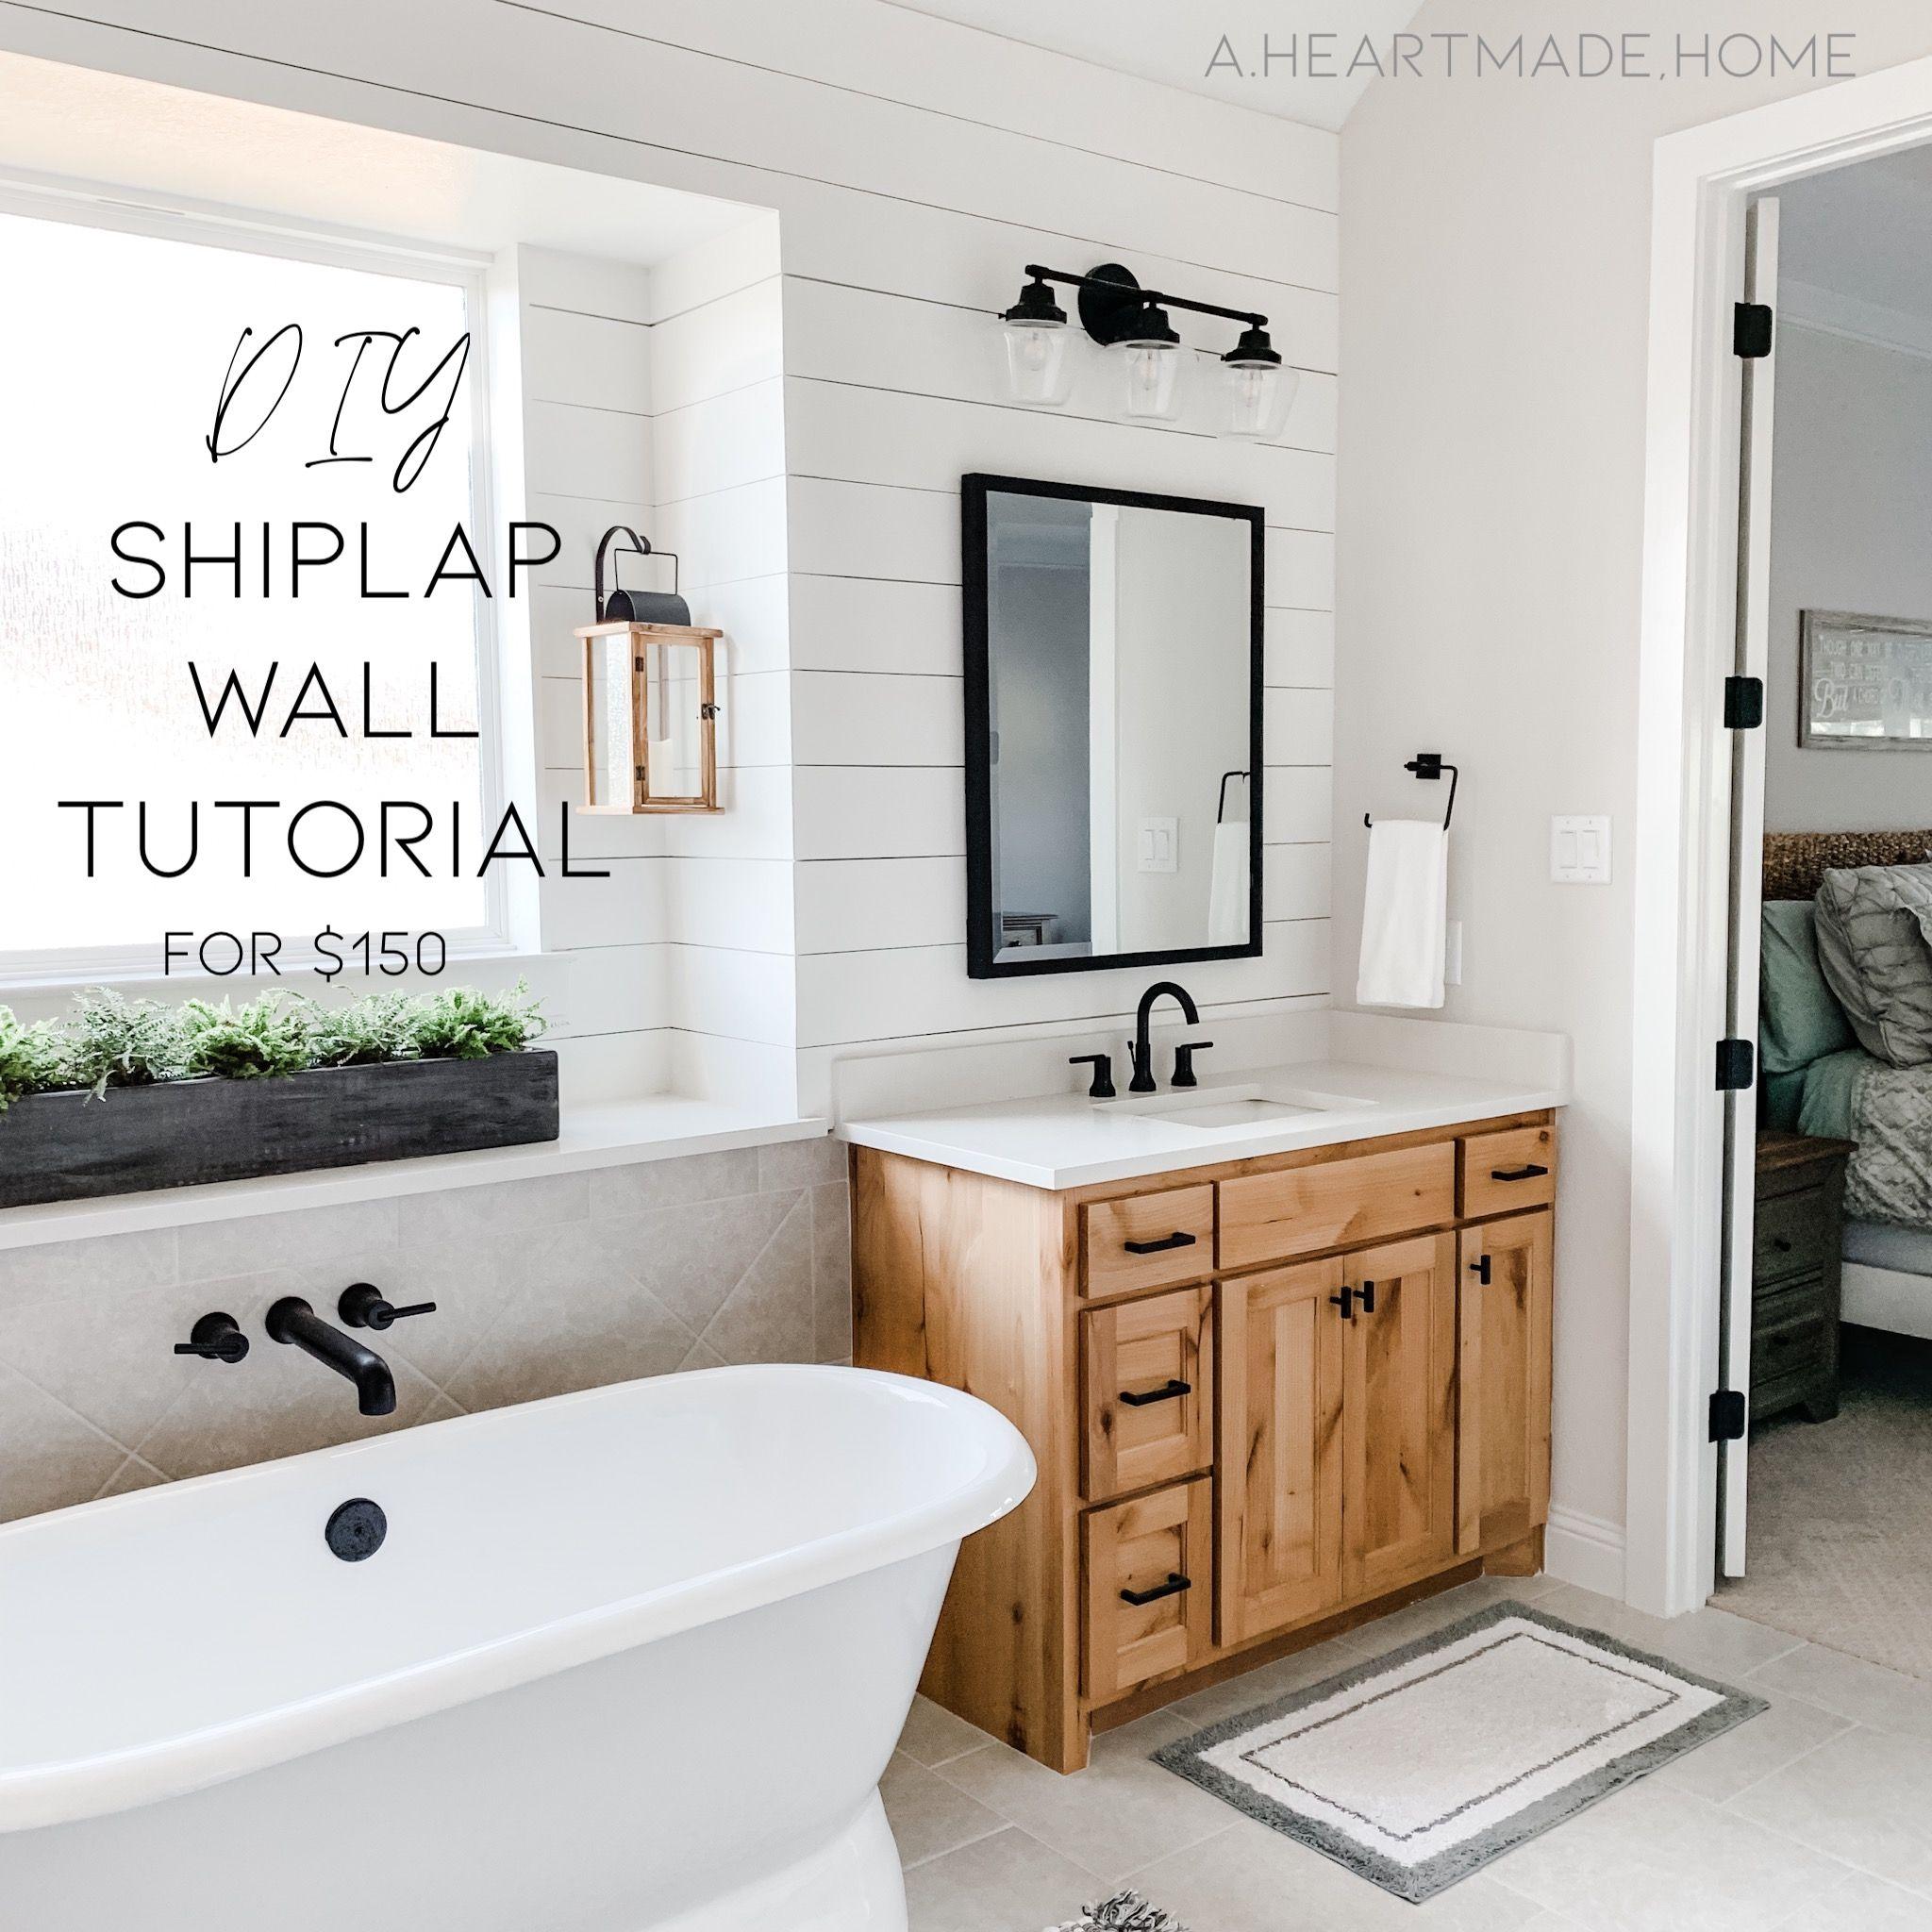 21 diy Bathroom wall ideas